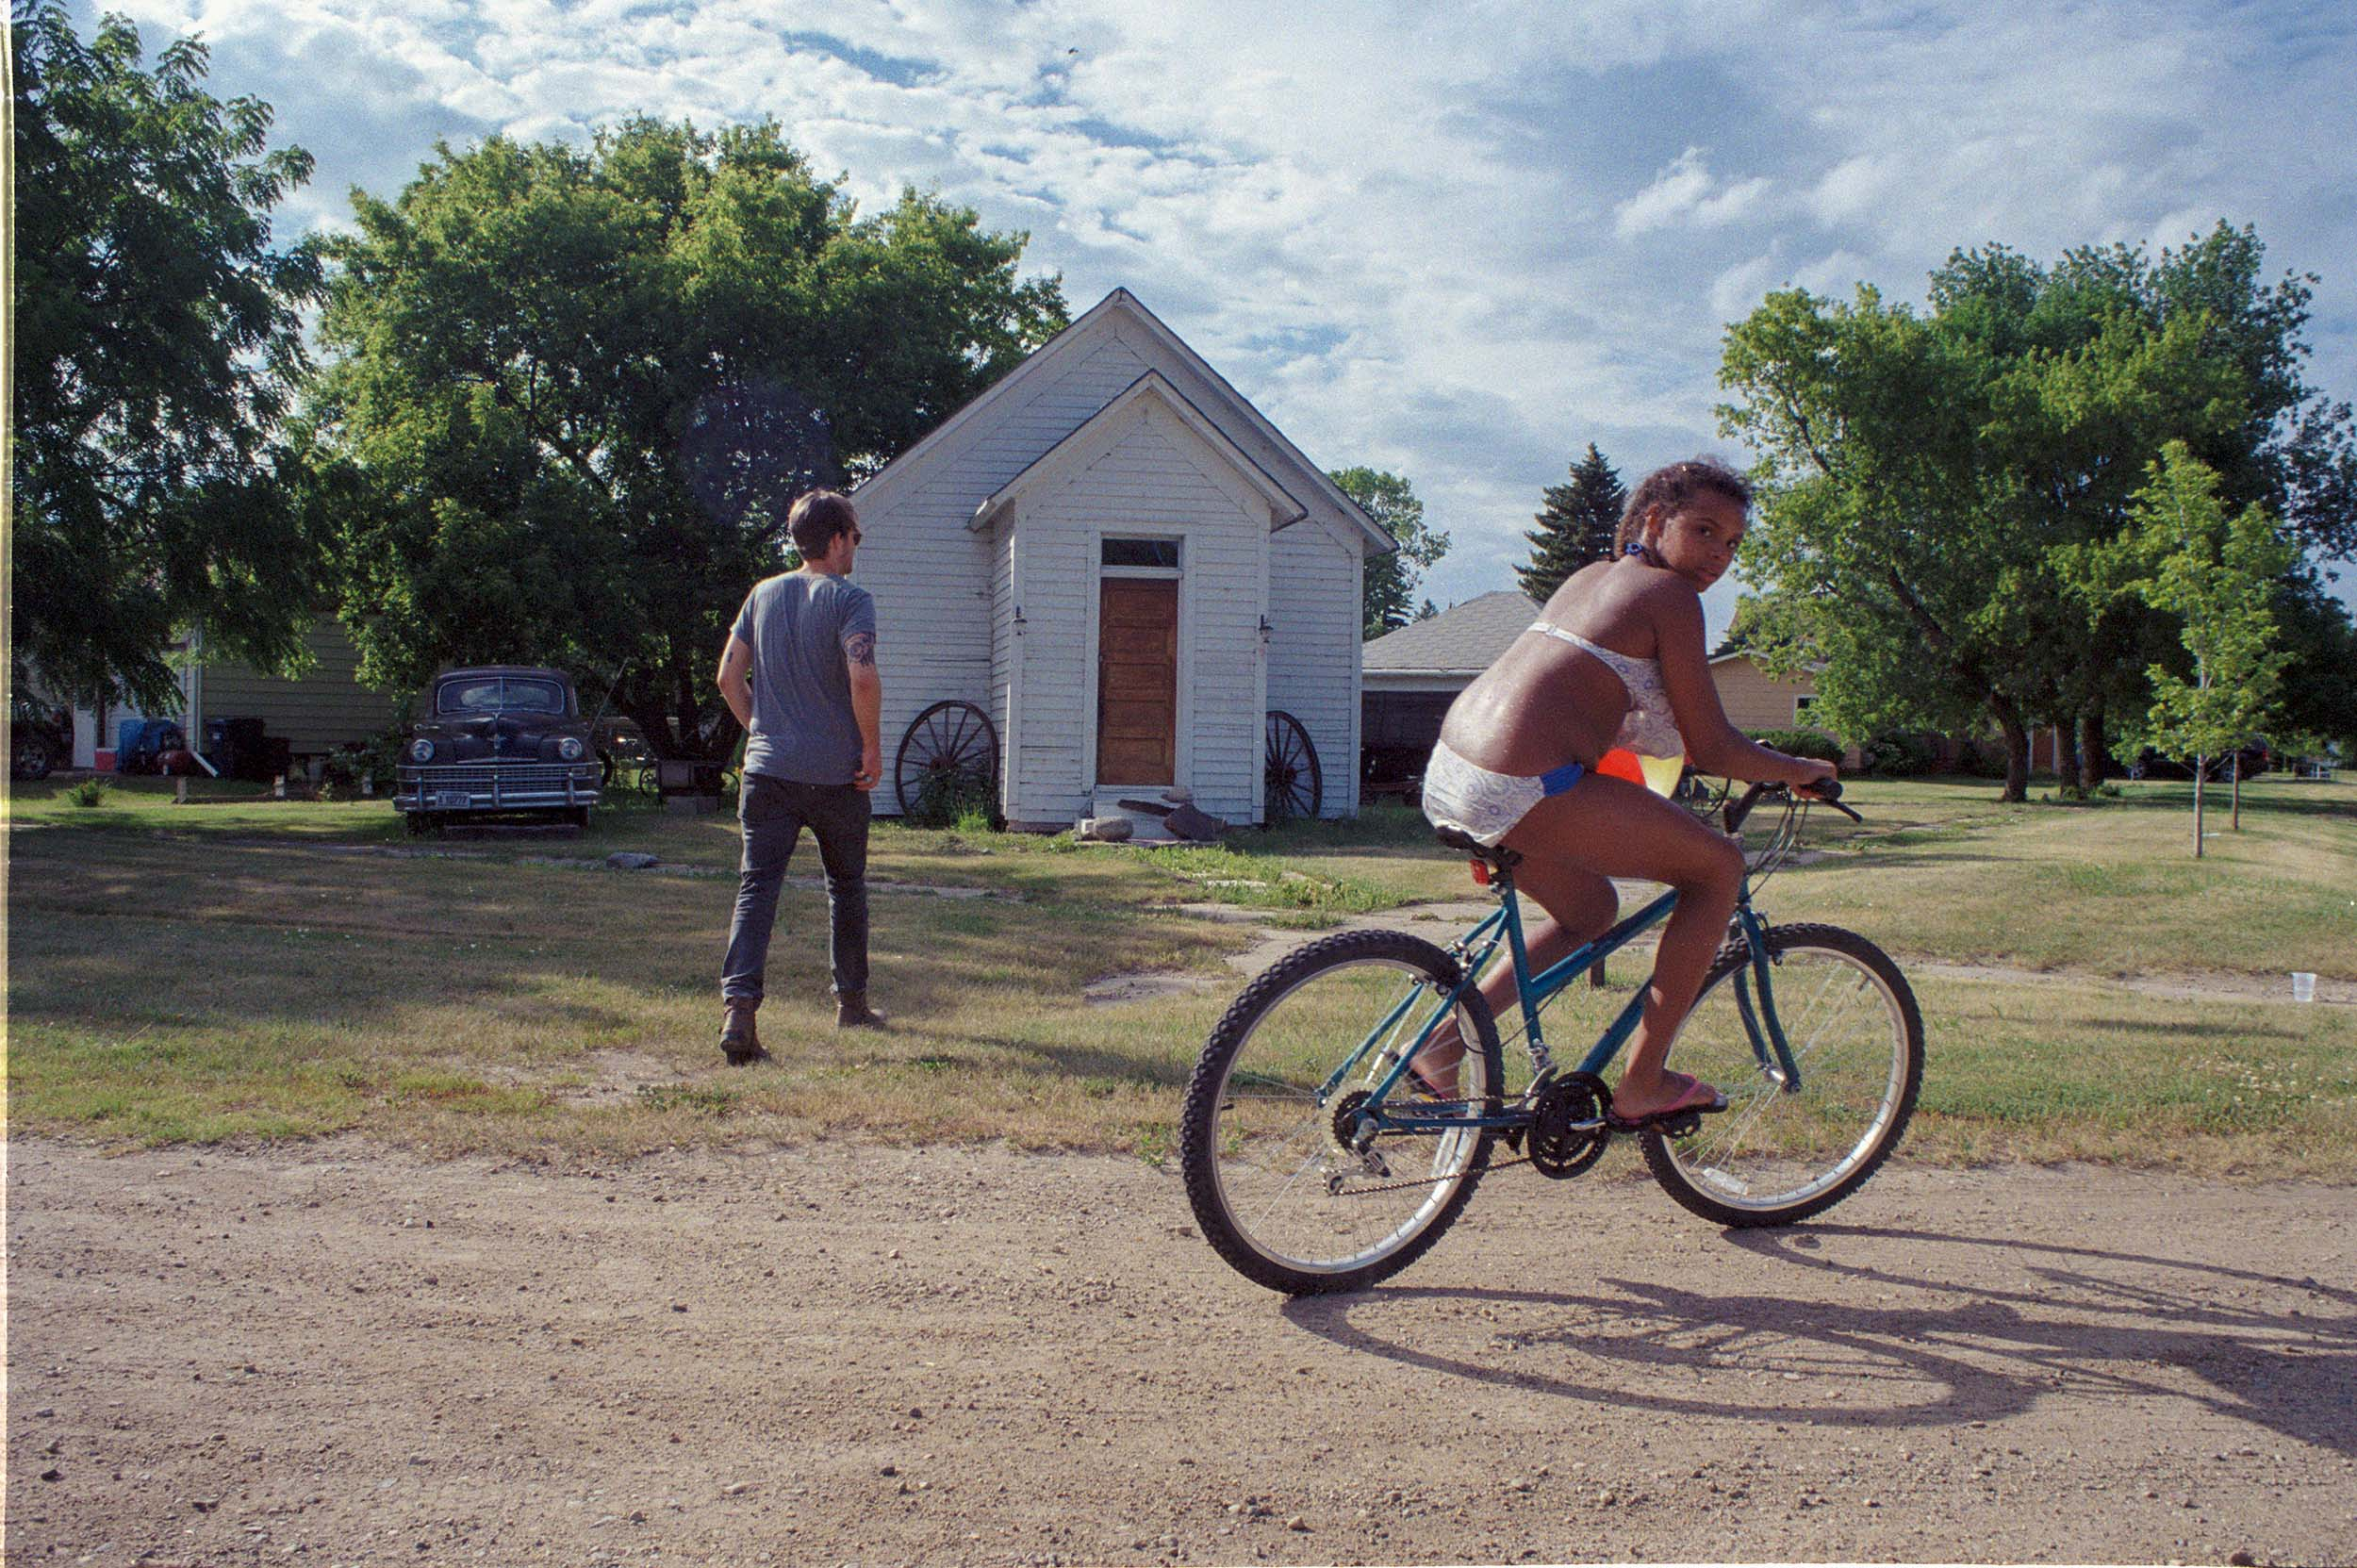 Playing in the neighborhood | Sykeston, North Dakota 2016